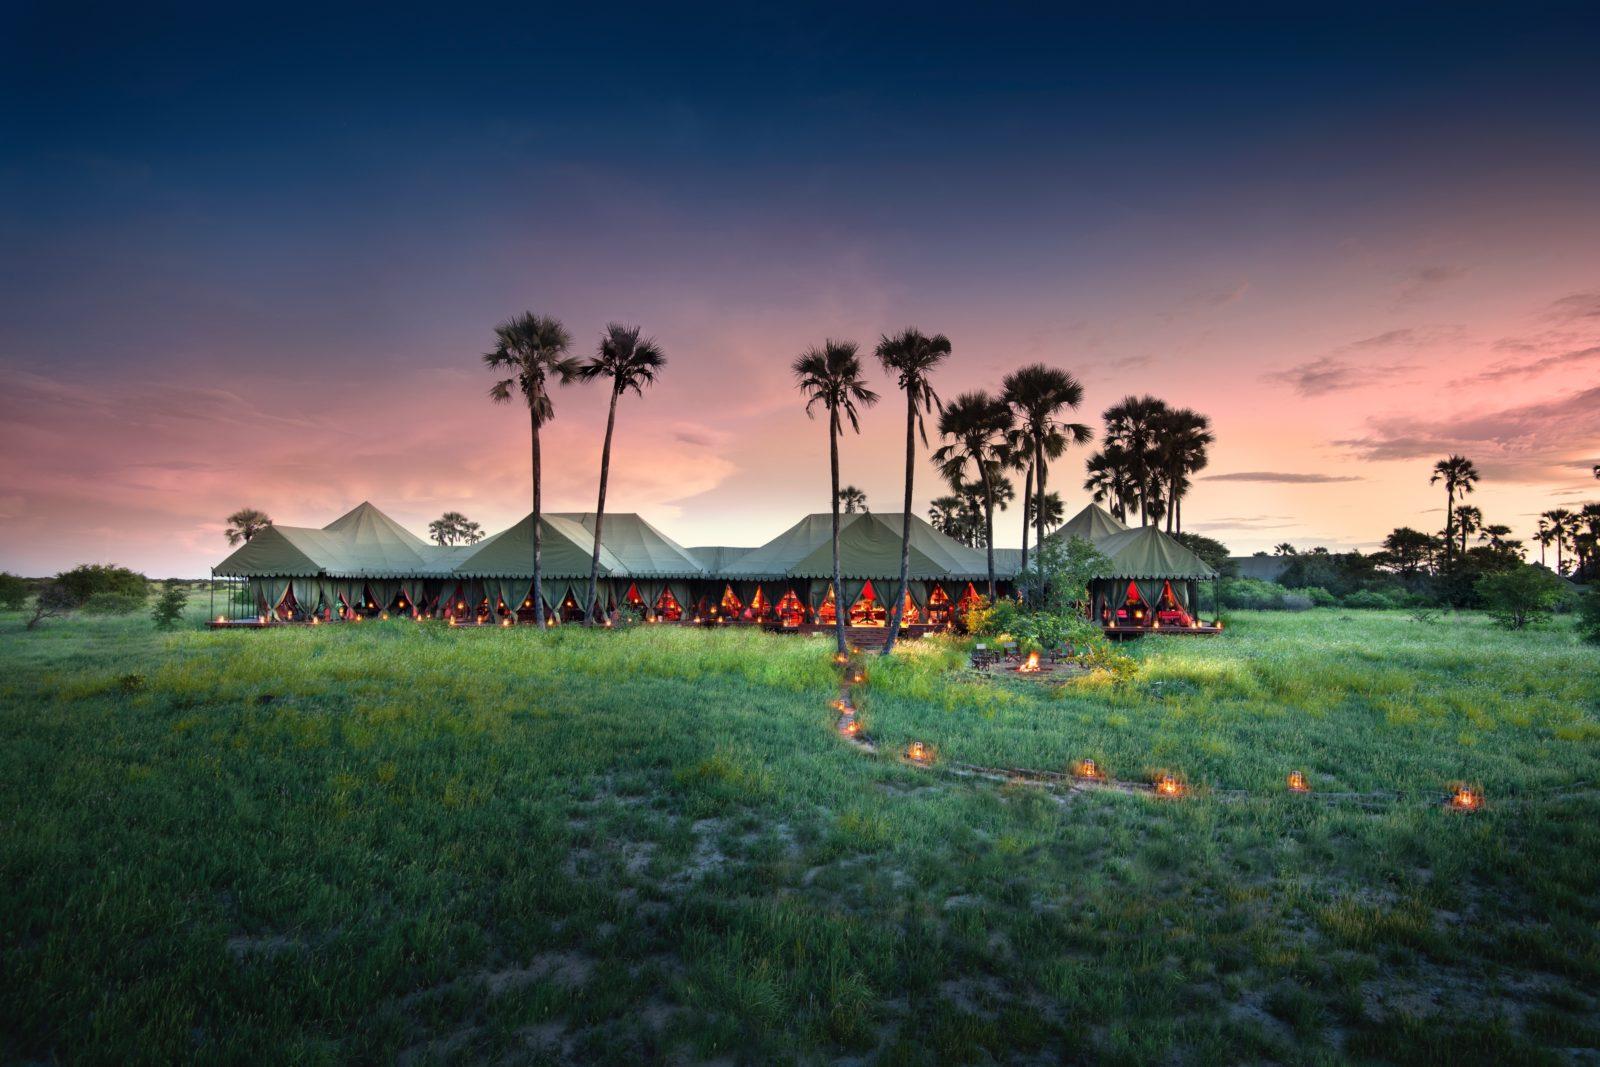 Jacks Camp luxury safari in the Kalahari